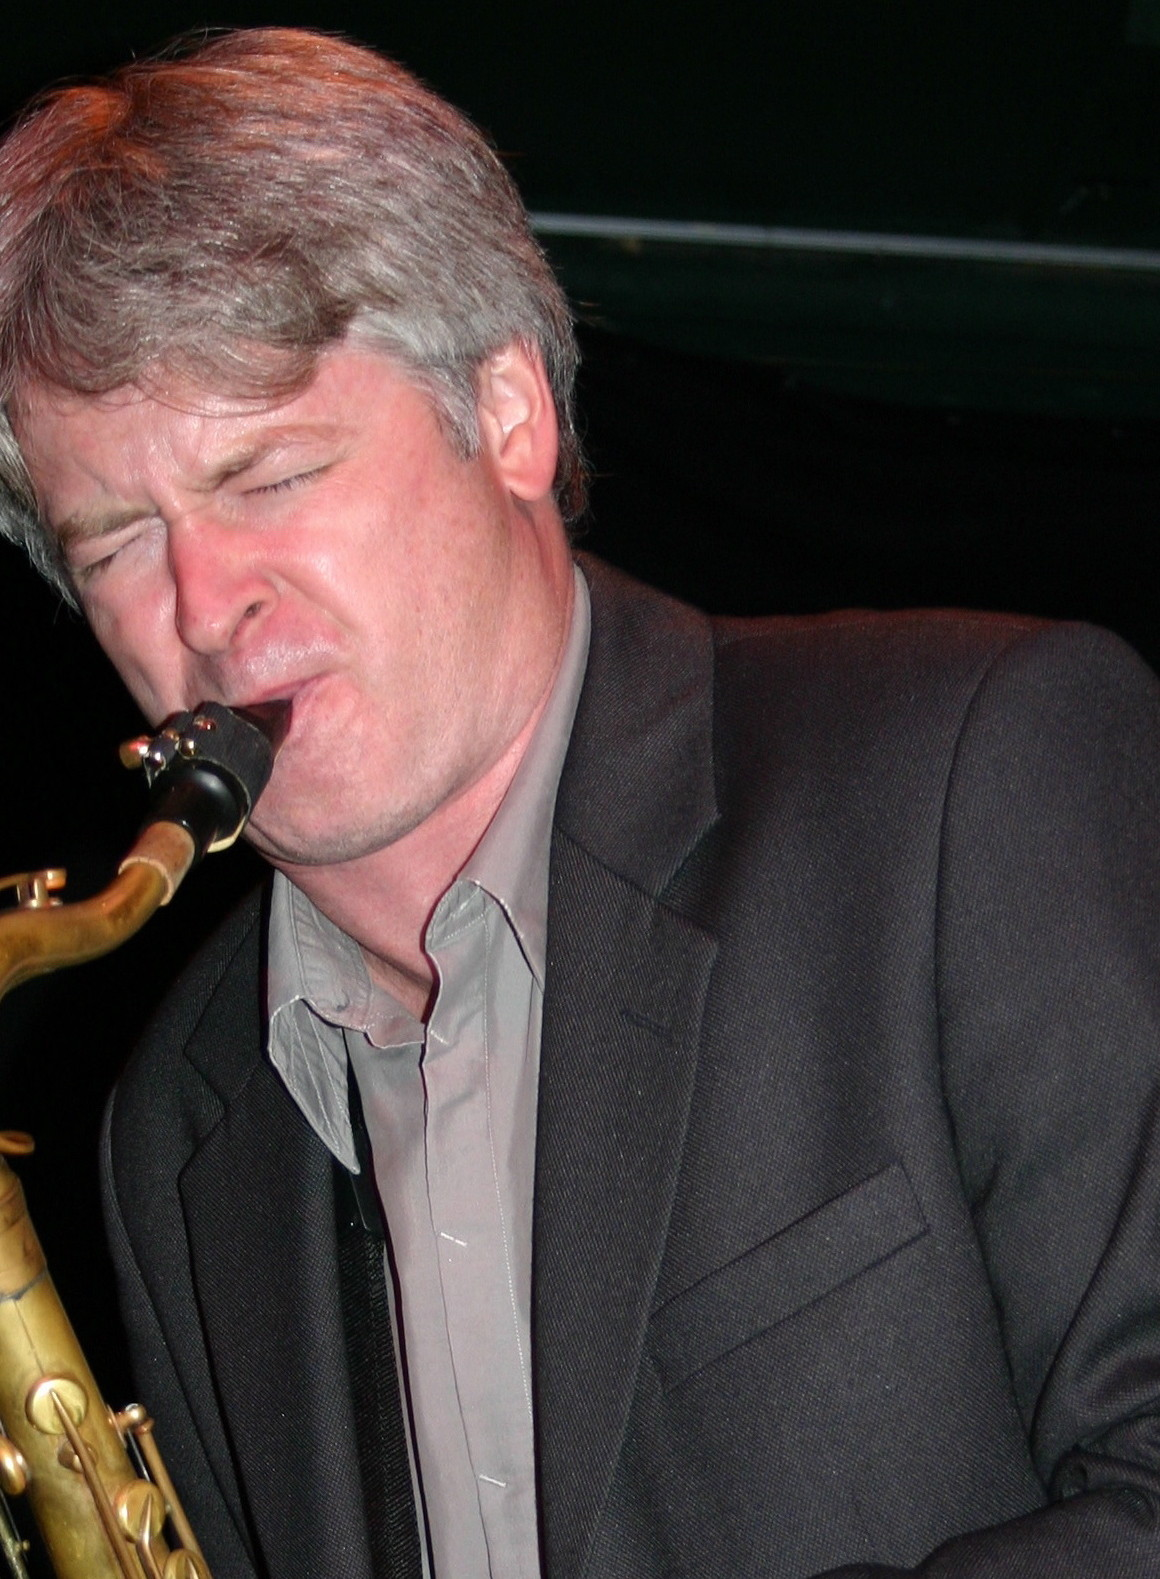 Mike Murley